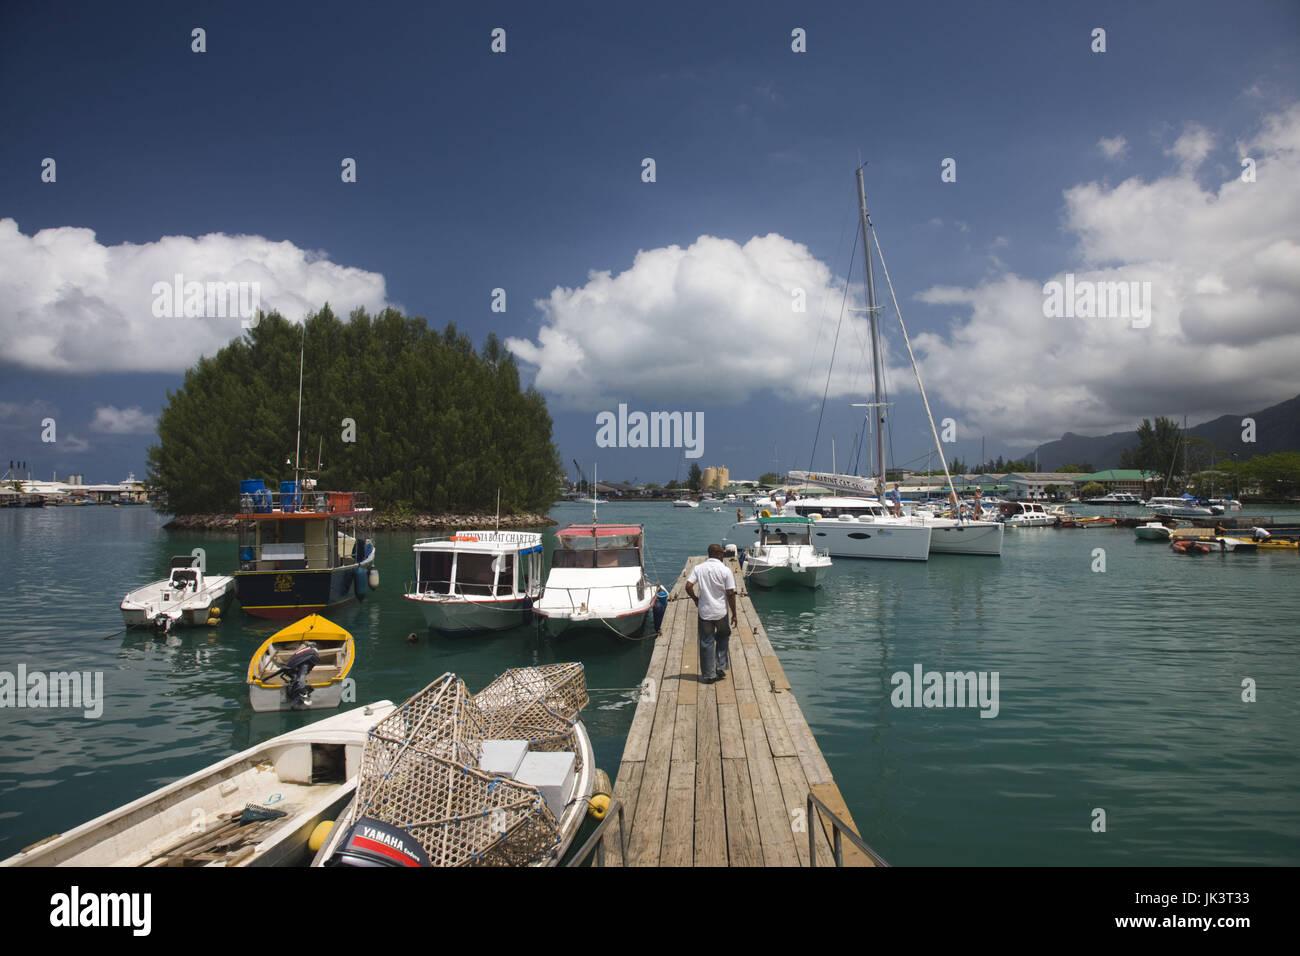 Seychelles, Mahe Island, Victoria, Botanical Gardens, small boat harbor - Stock Image